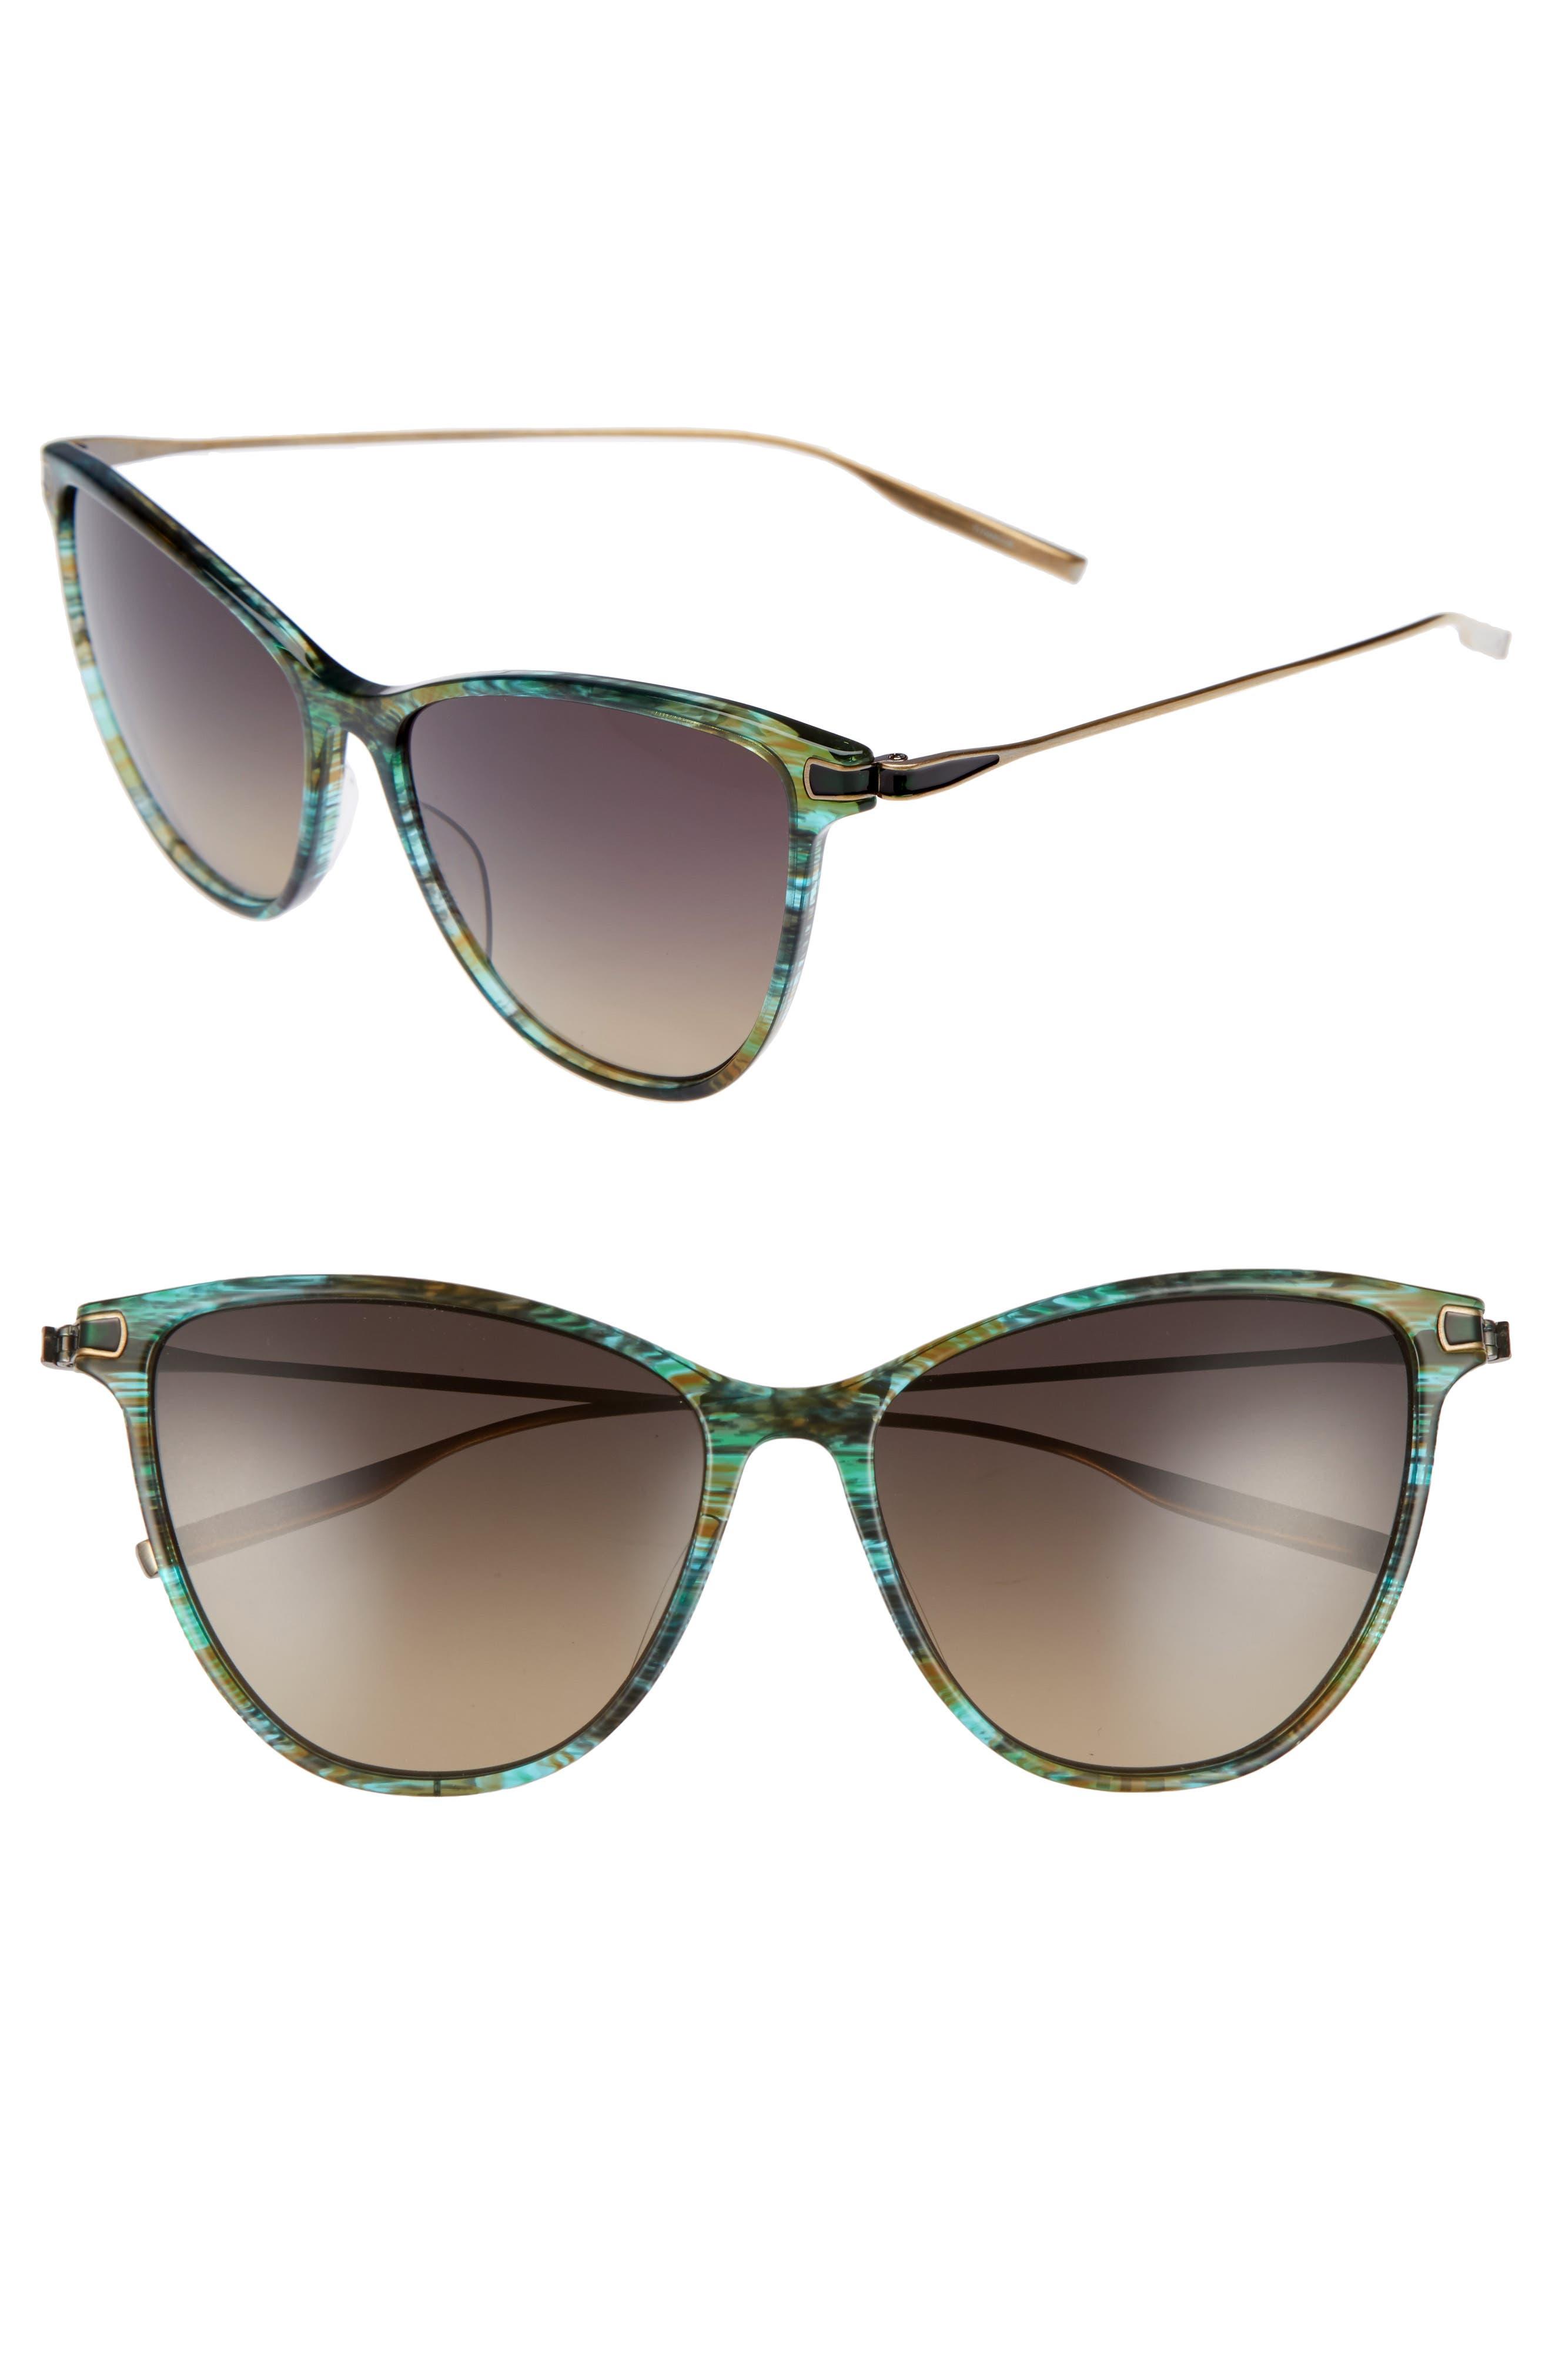 SALT.,                             Nia 58mm Polarized Cat Eye Sunglasses,                             Main thumbnail 1, color,                             300